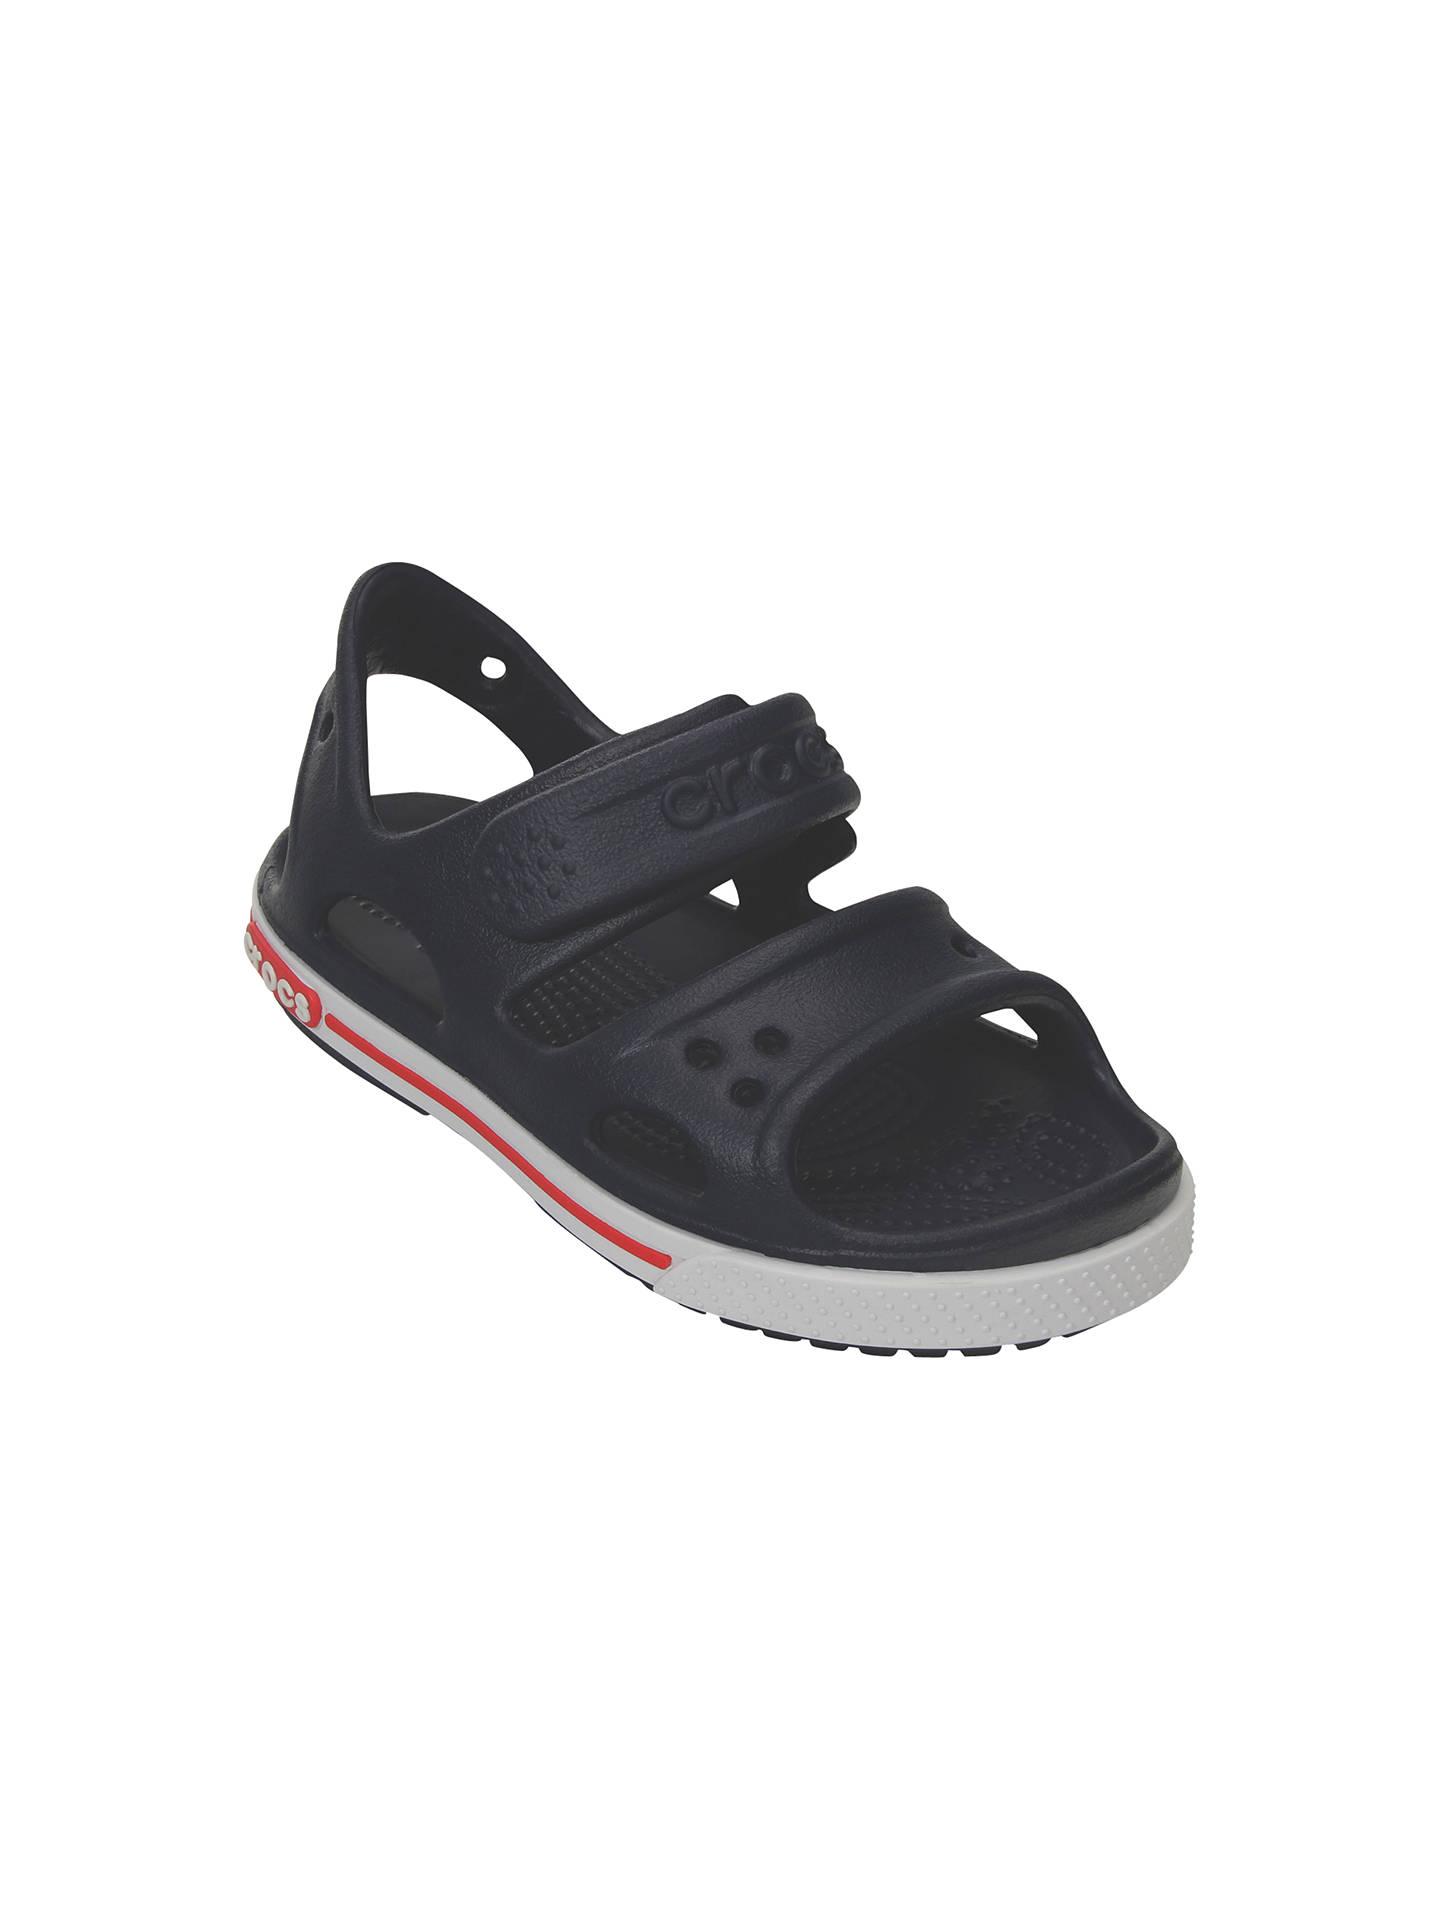 5f40472d768b5 Crocs Children s Crocband II Sandals at John Lewis   Partners